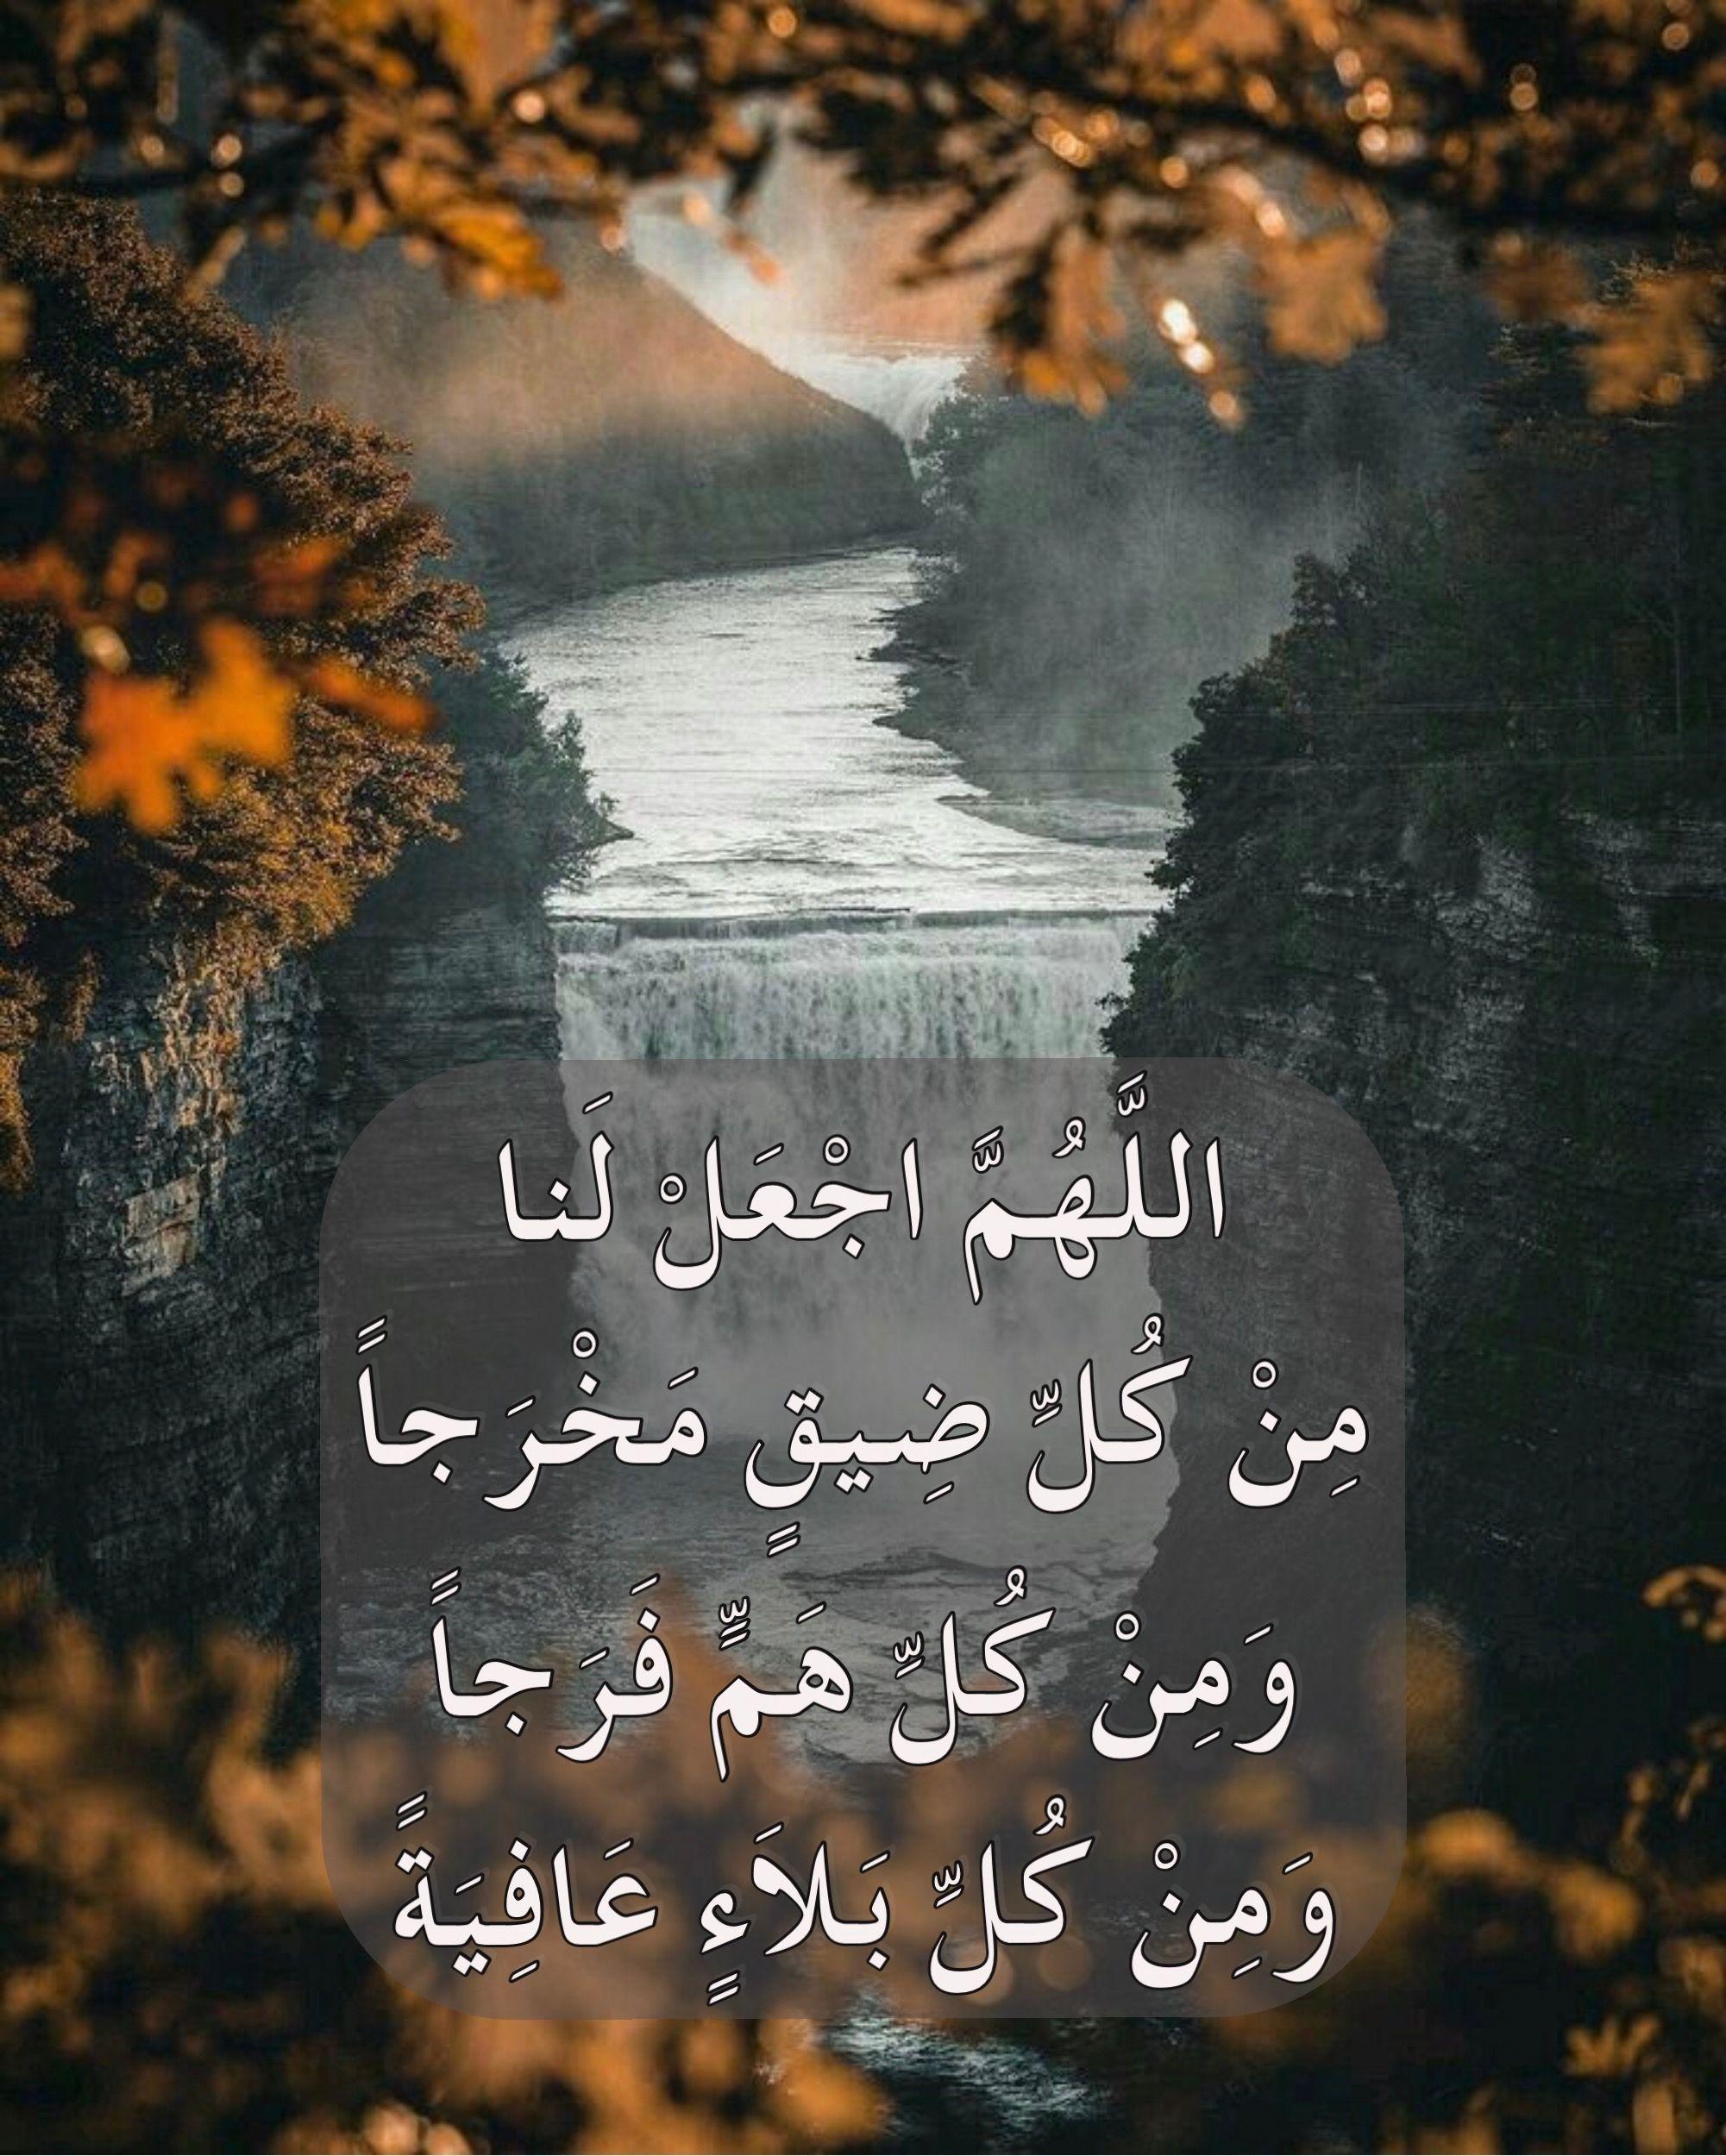 Pin By الأثر الجميل On دعاء Islamic Quotes Islam English Quotes